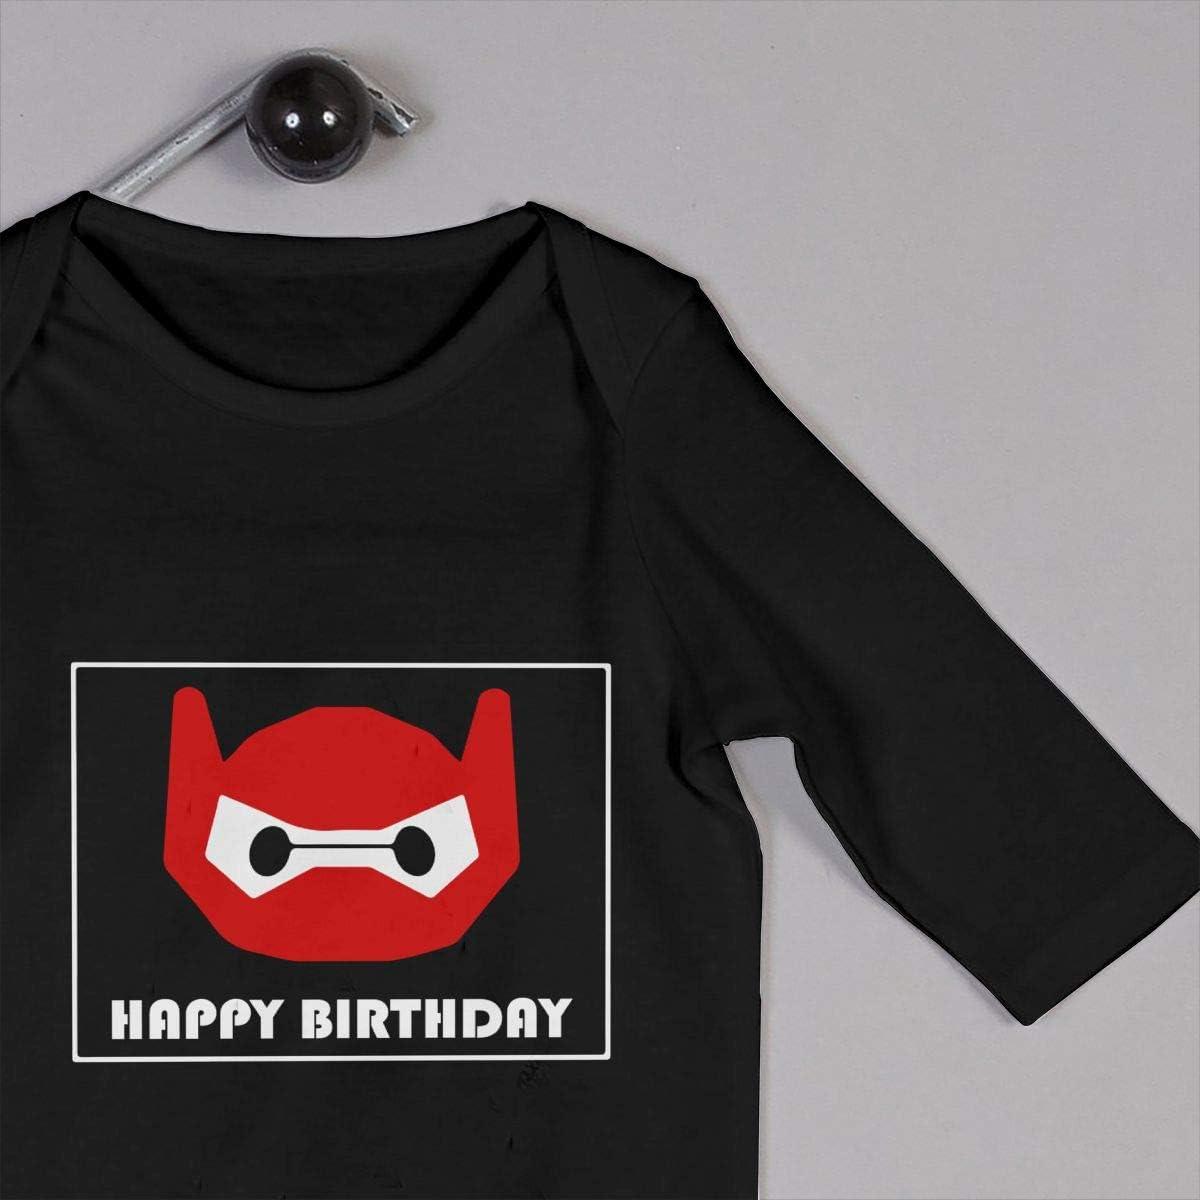 KinHui Cute Romper Black for Baby Girl Jumpsuit Baymax-Happy Birthday-1